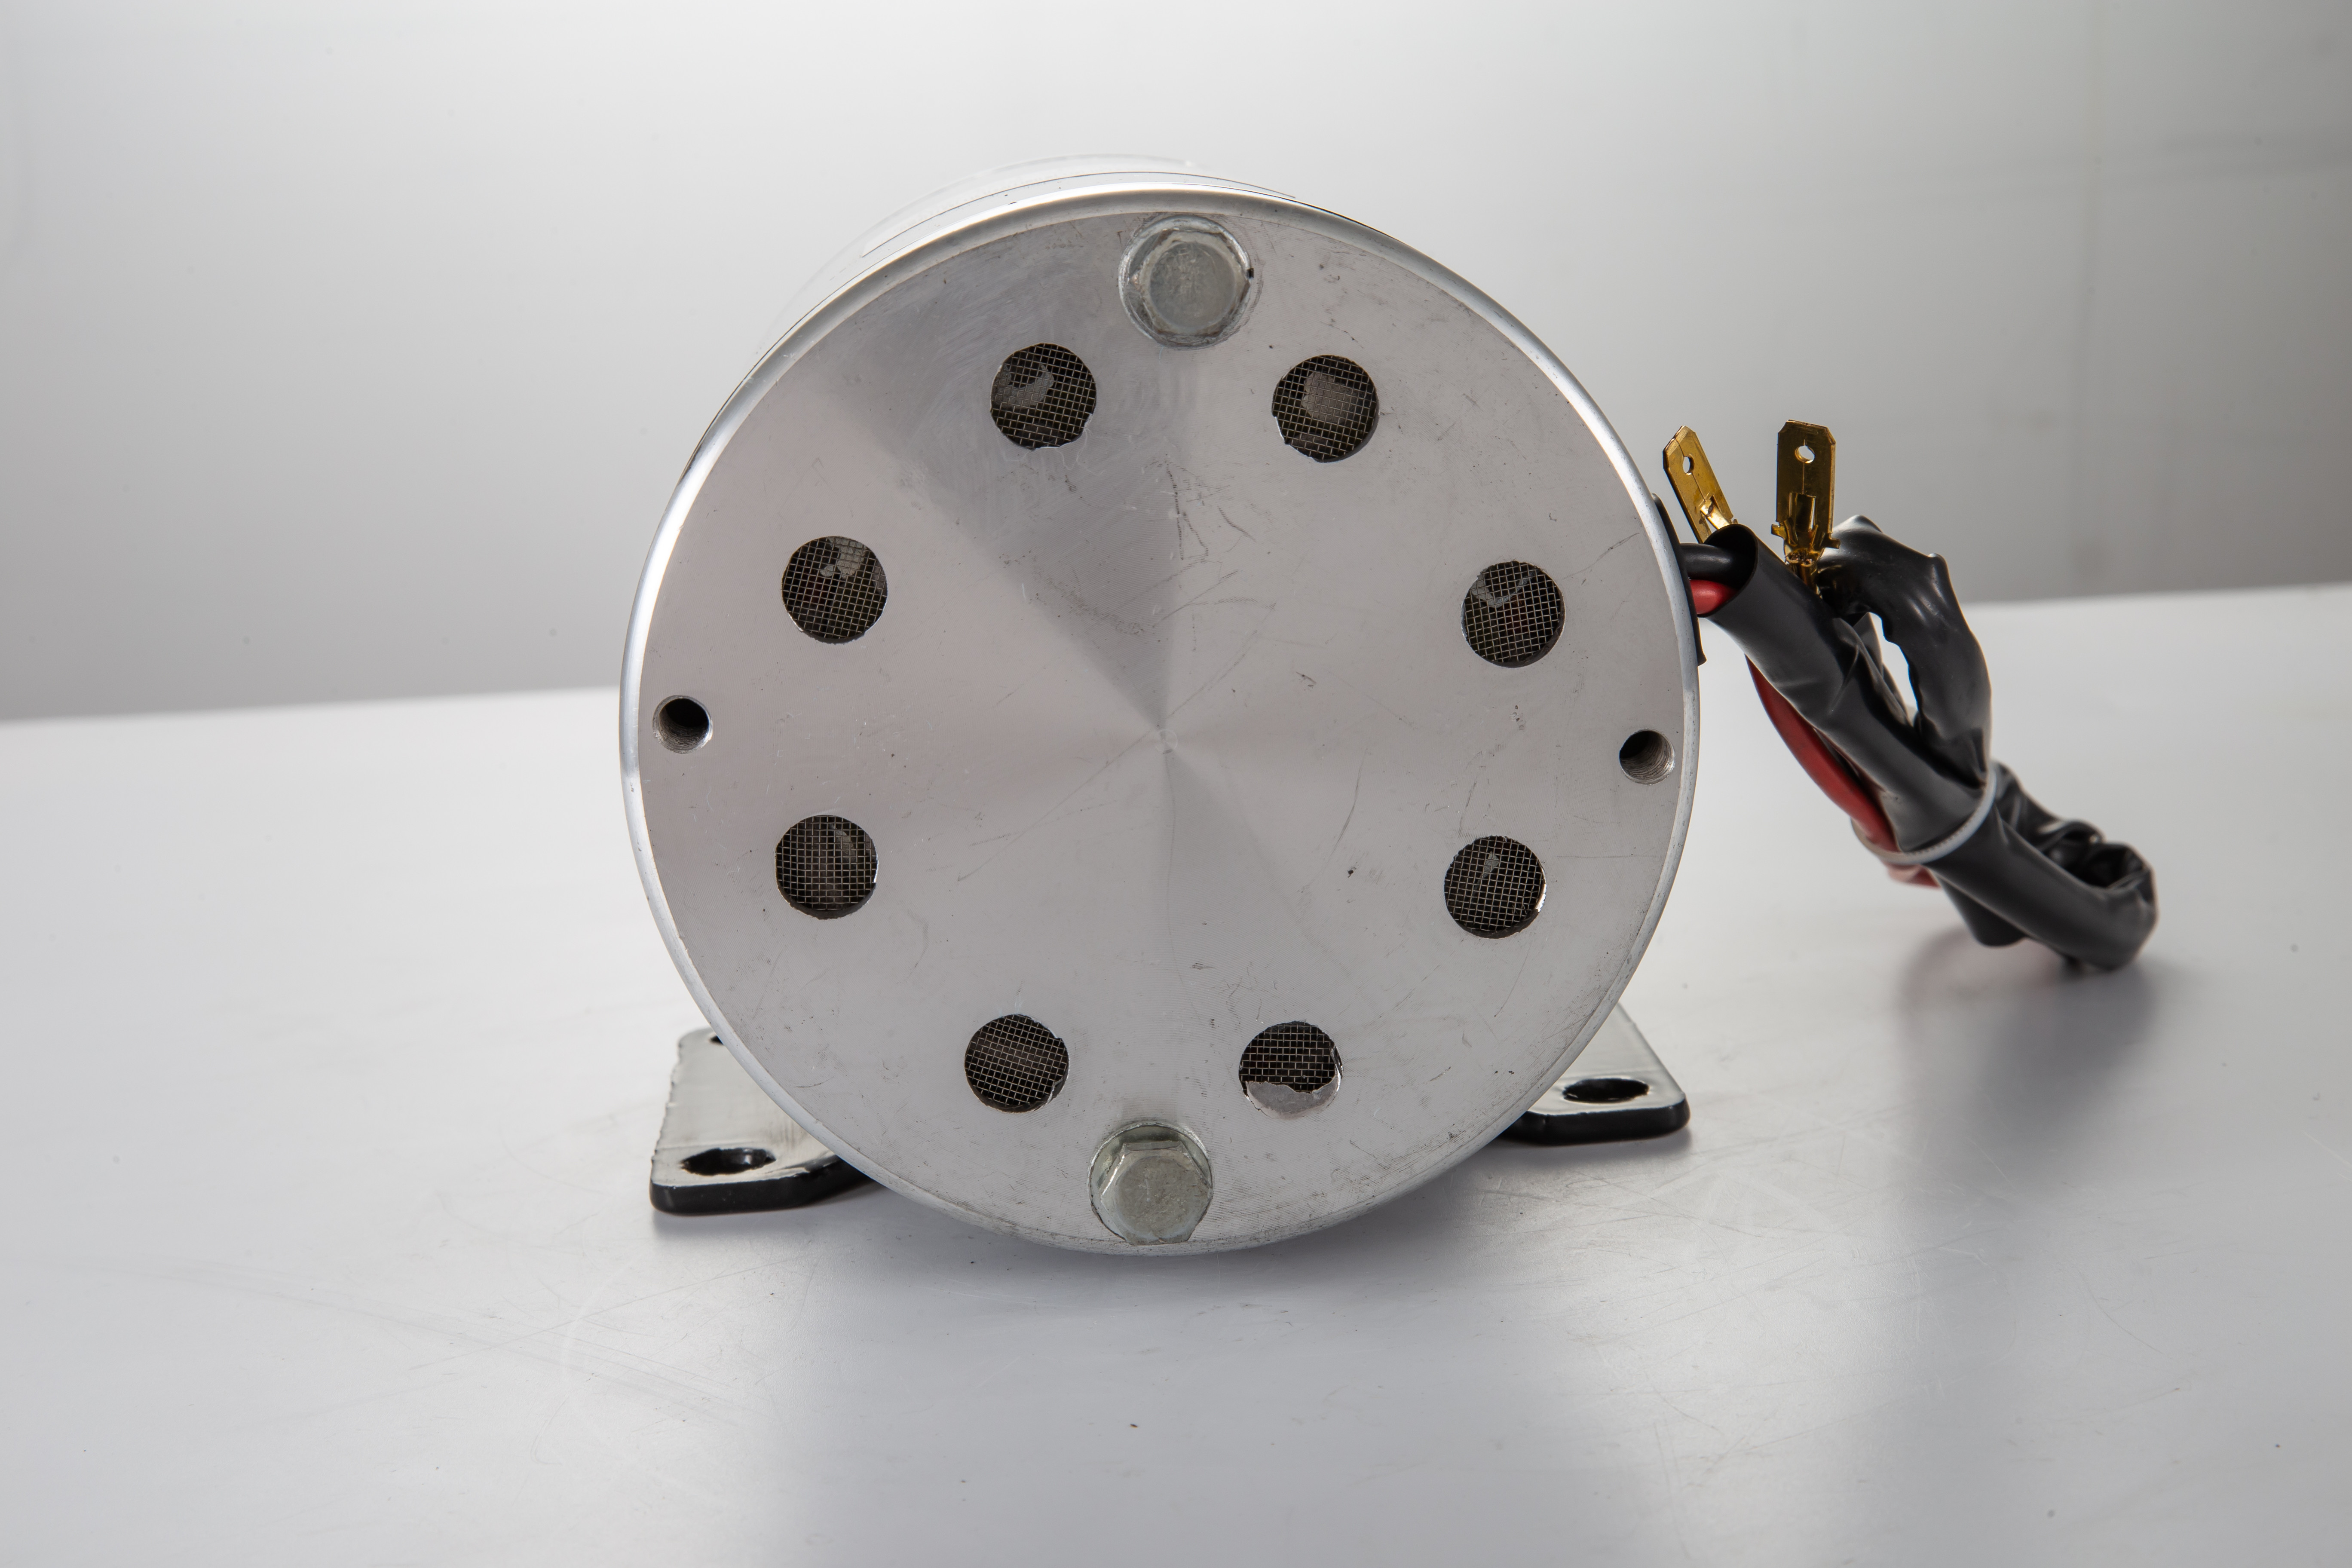 36v-Electric-Motor-controller-throttle-kit-f-Scooter-E-Scooter-ATV-Permanent thumbnail 115